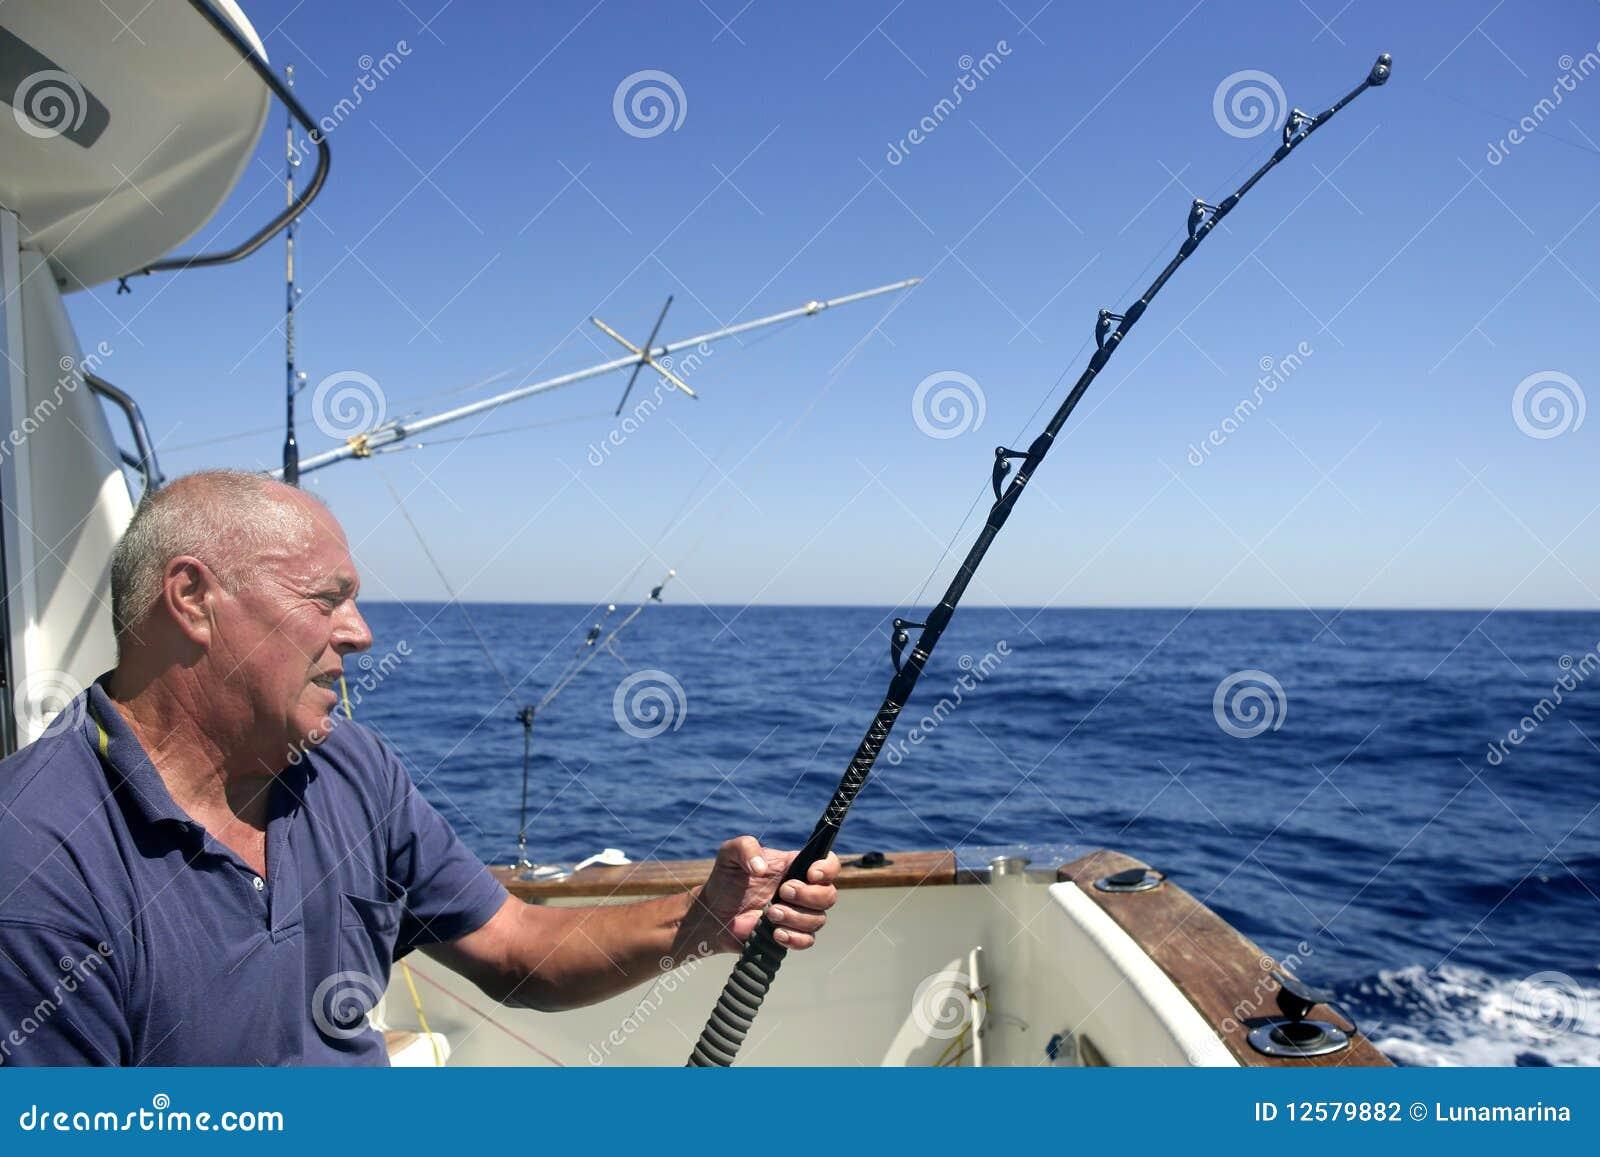 Angler Senior Big Game Sport Fishing Boat Stock Photography - Image ...